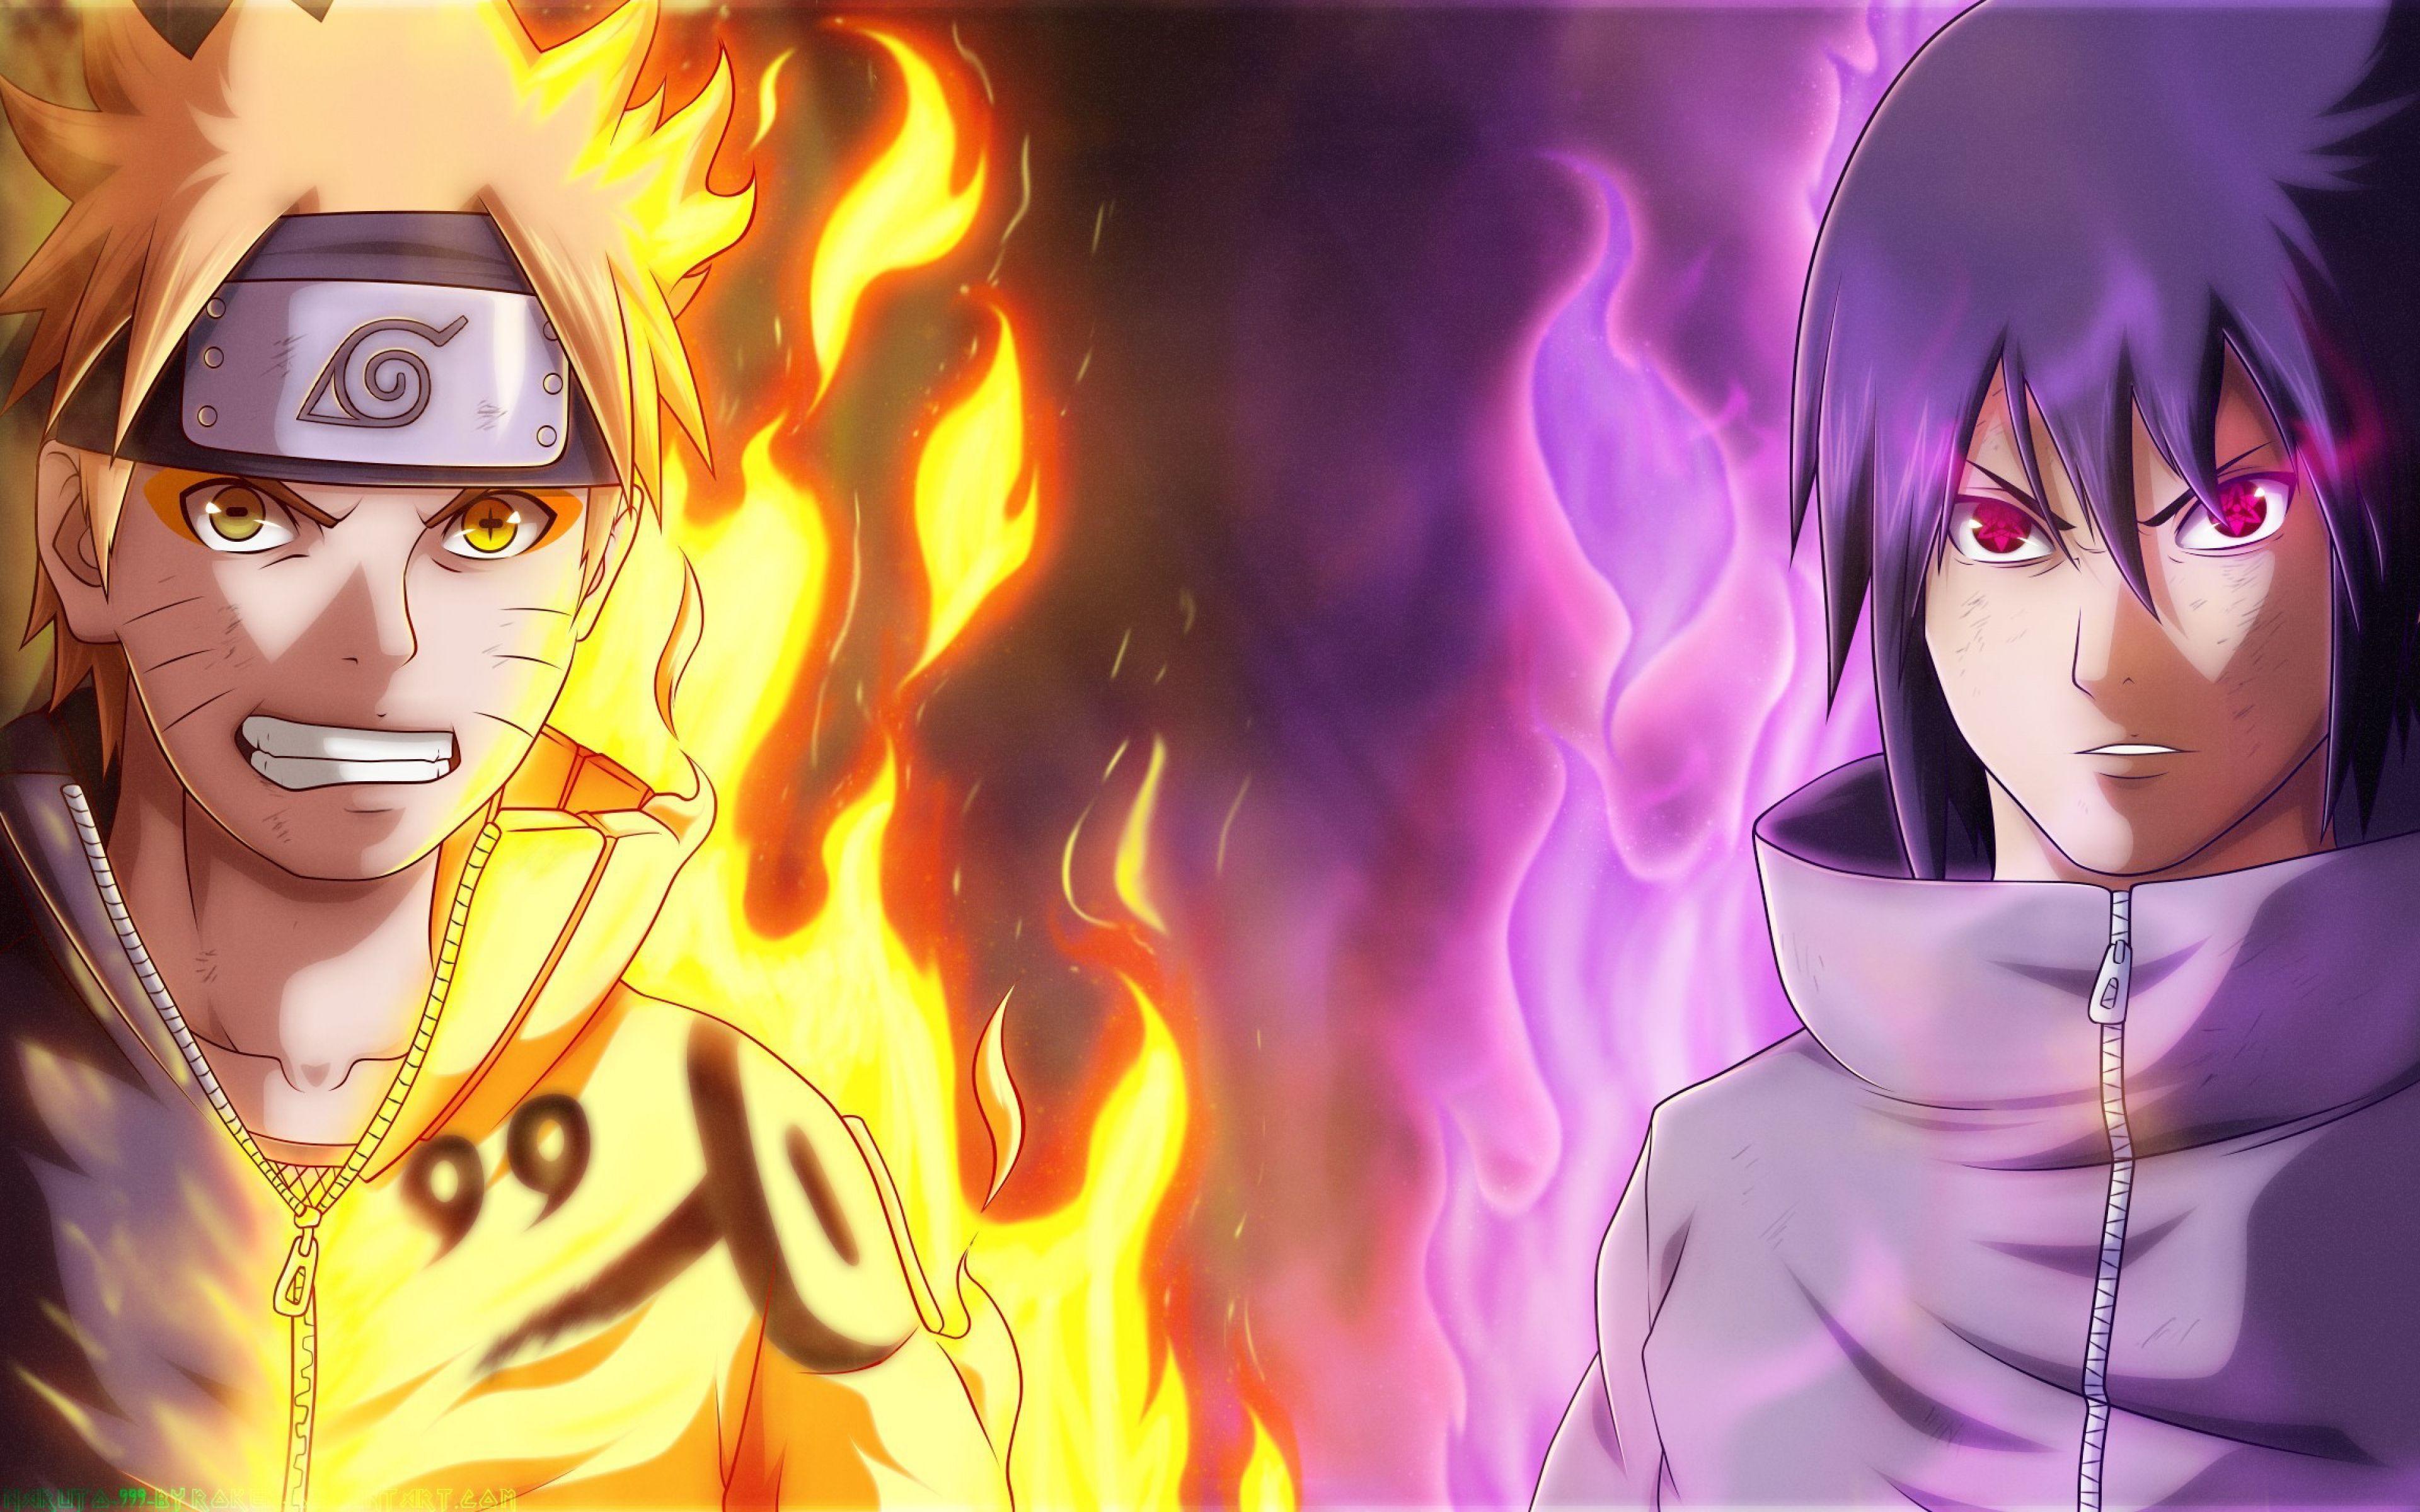 3840x2400 Naruto Vs Sasuke 4k Wallpaper Desktop Cinema Wallpaper 1080p Wallpaper Anime Sasuke Anime Naruto